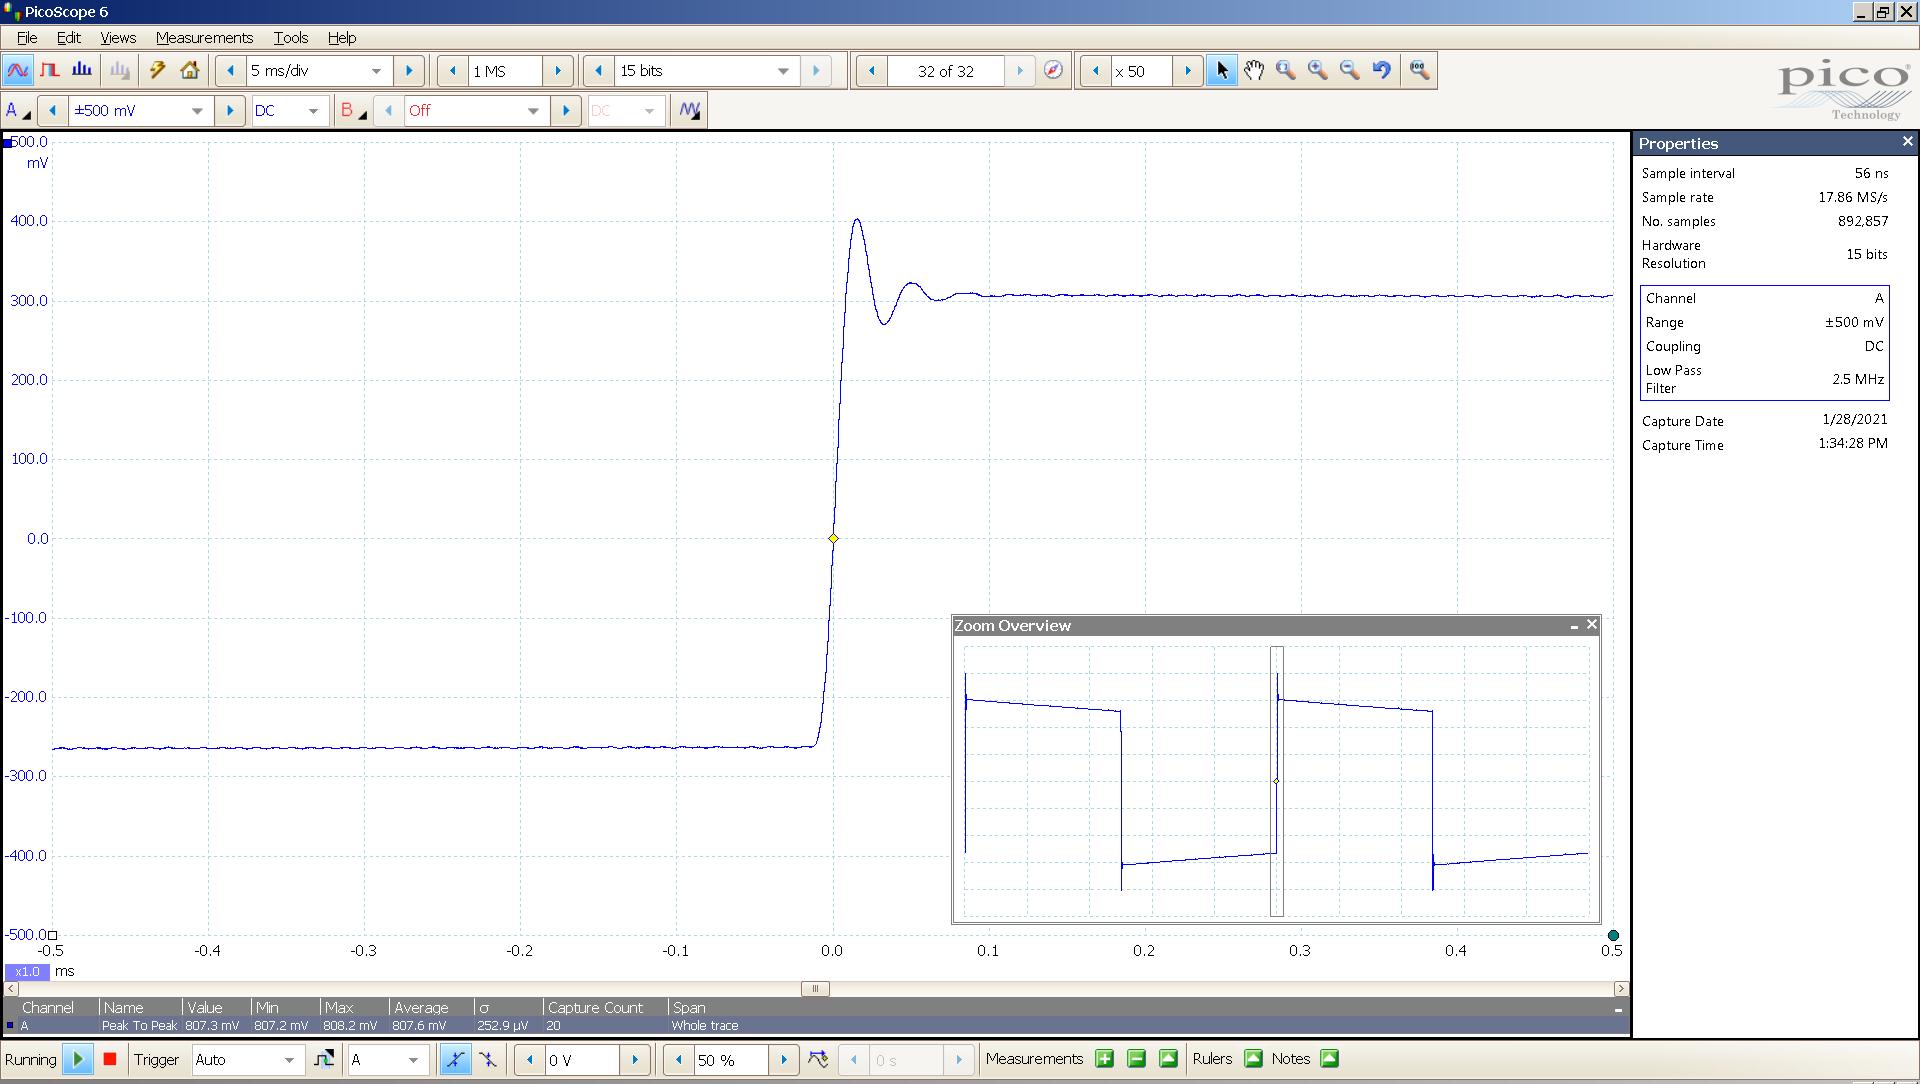 25 20210128 dac2541 40 Hz sqr 100us div  -20dBFS 88K USB SE Slow - no markers.png